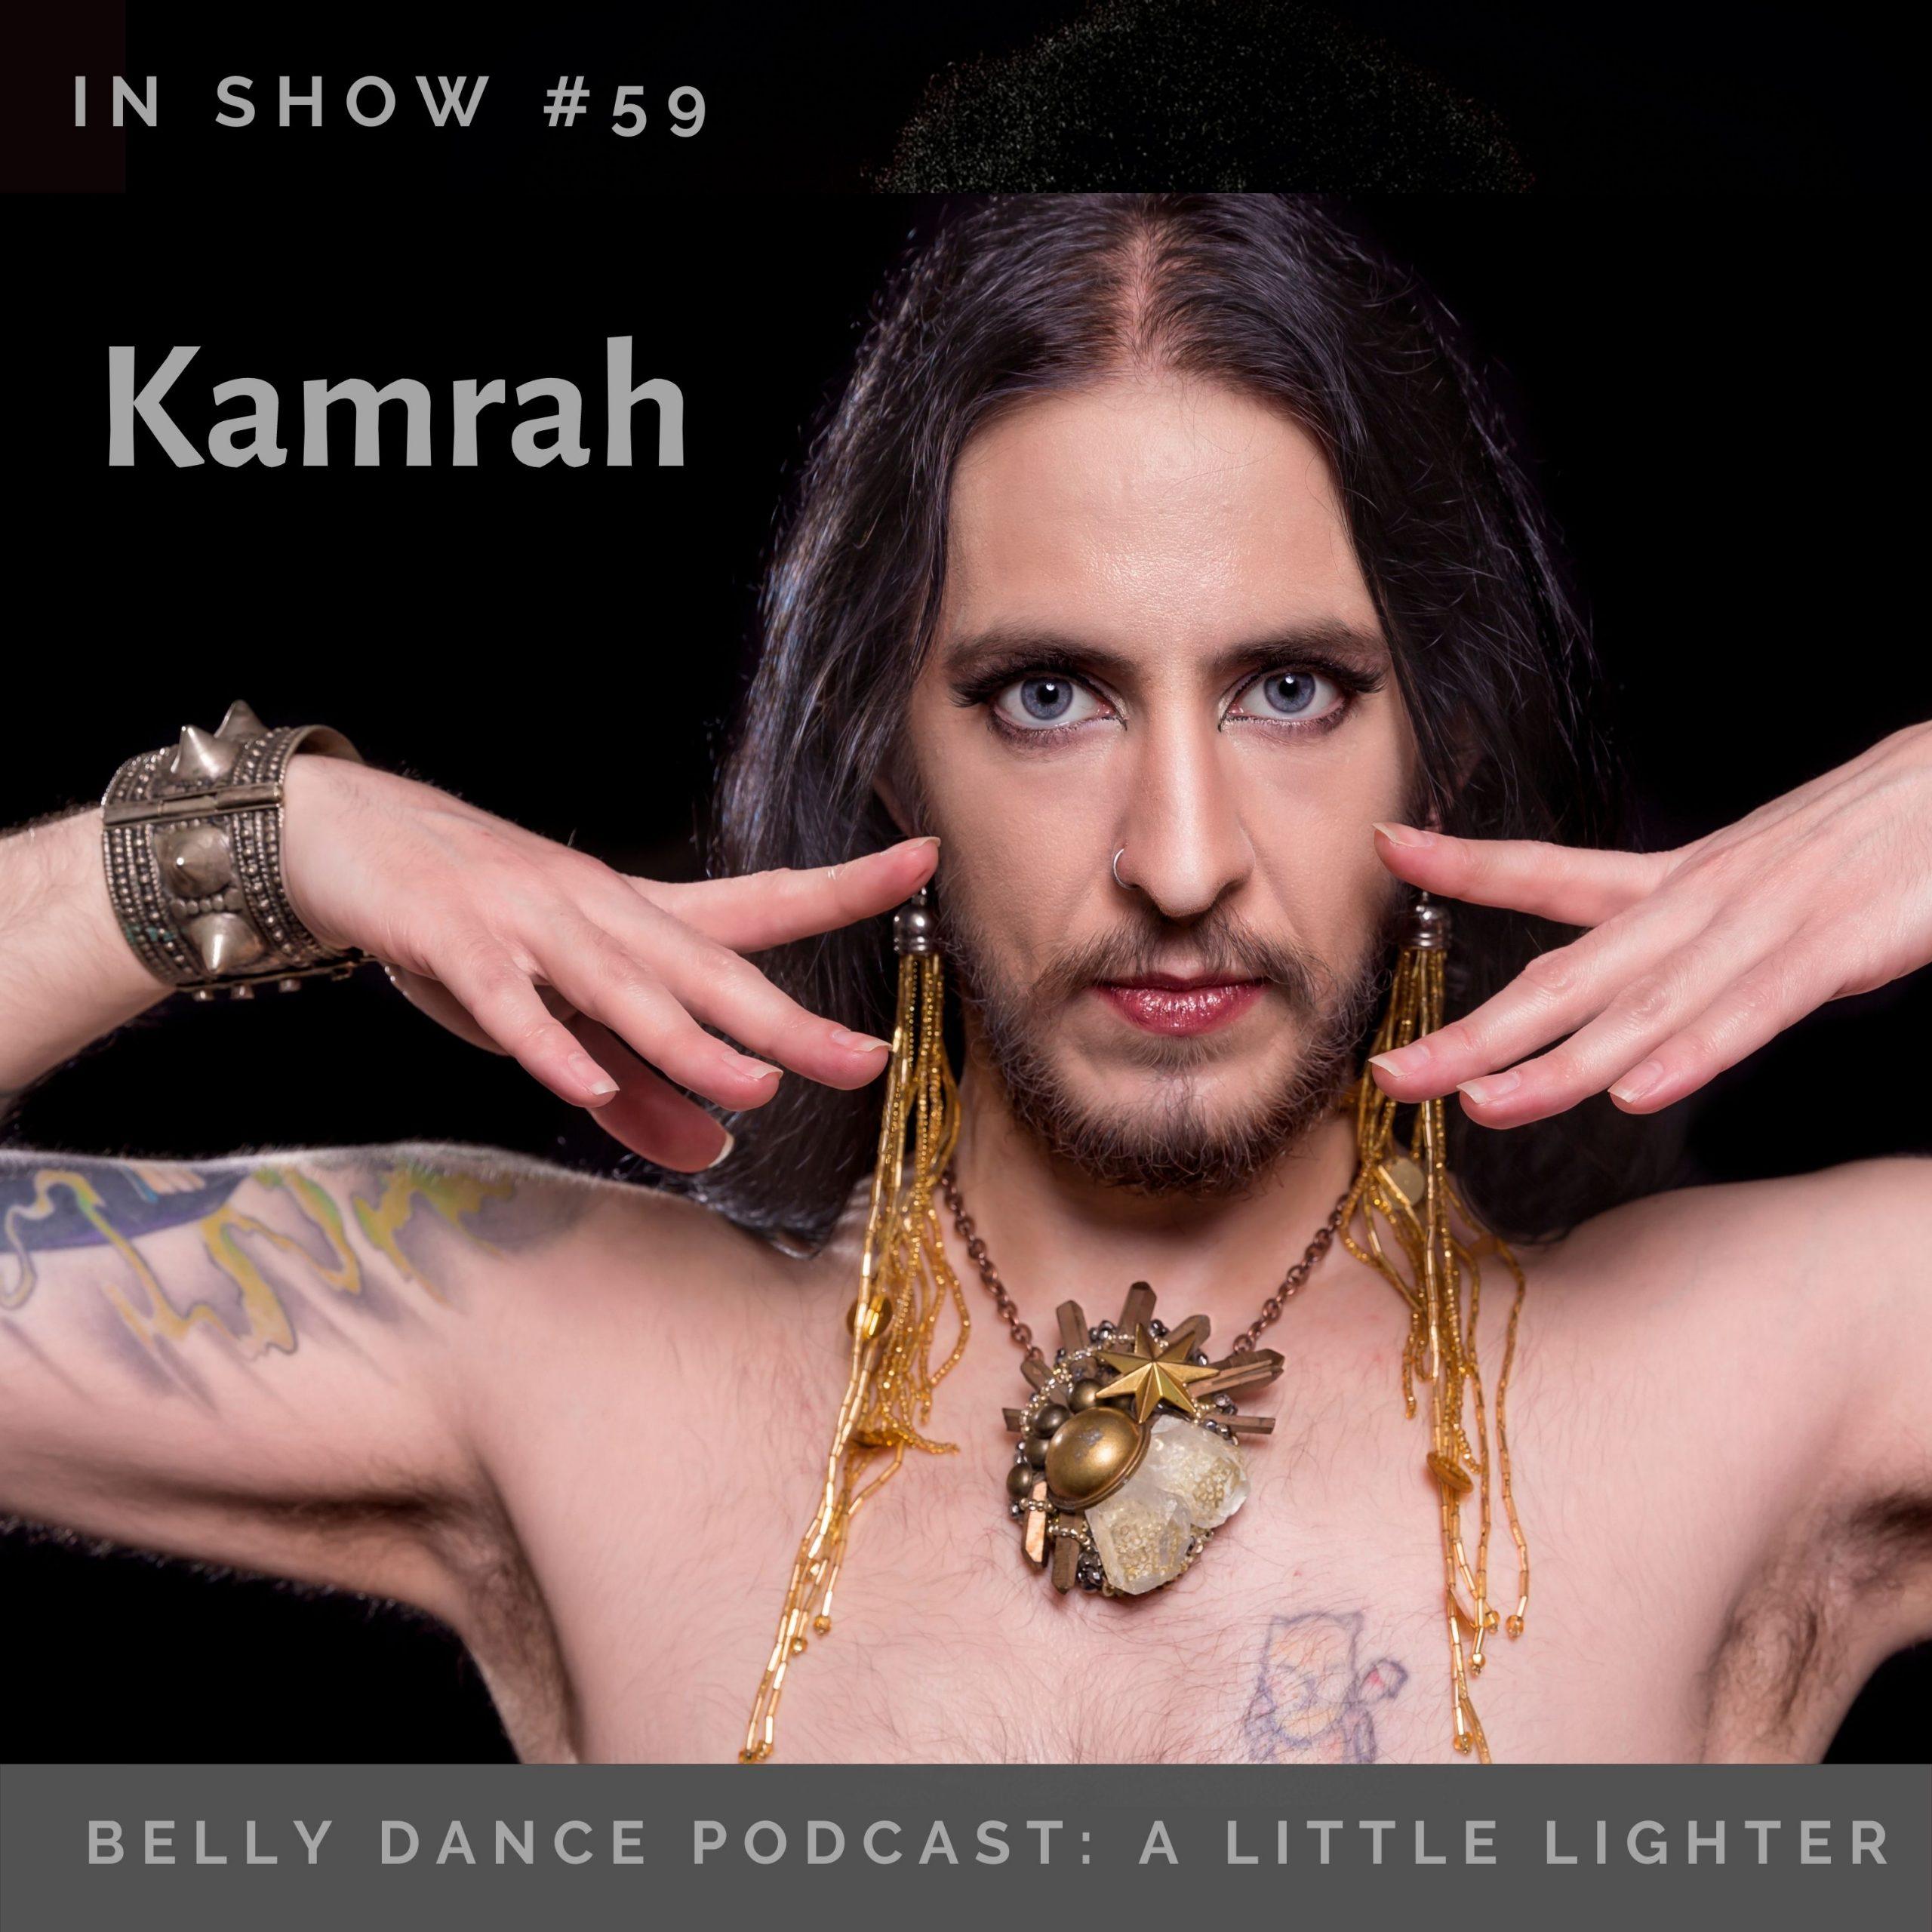 Kamrah in A Little Ligher Belly Dance Podcast 059